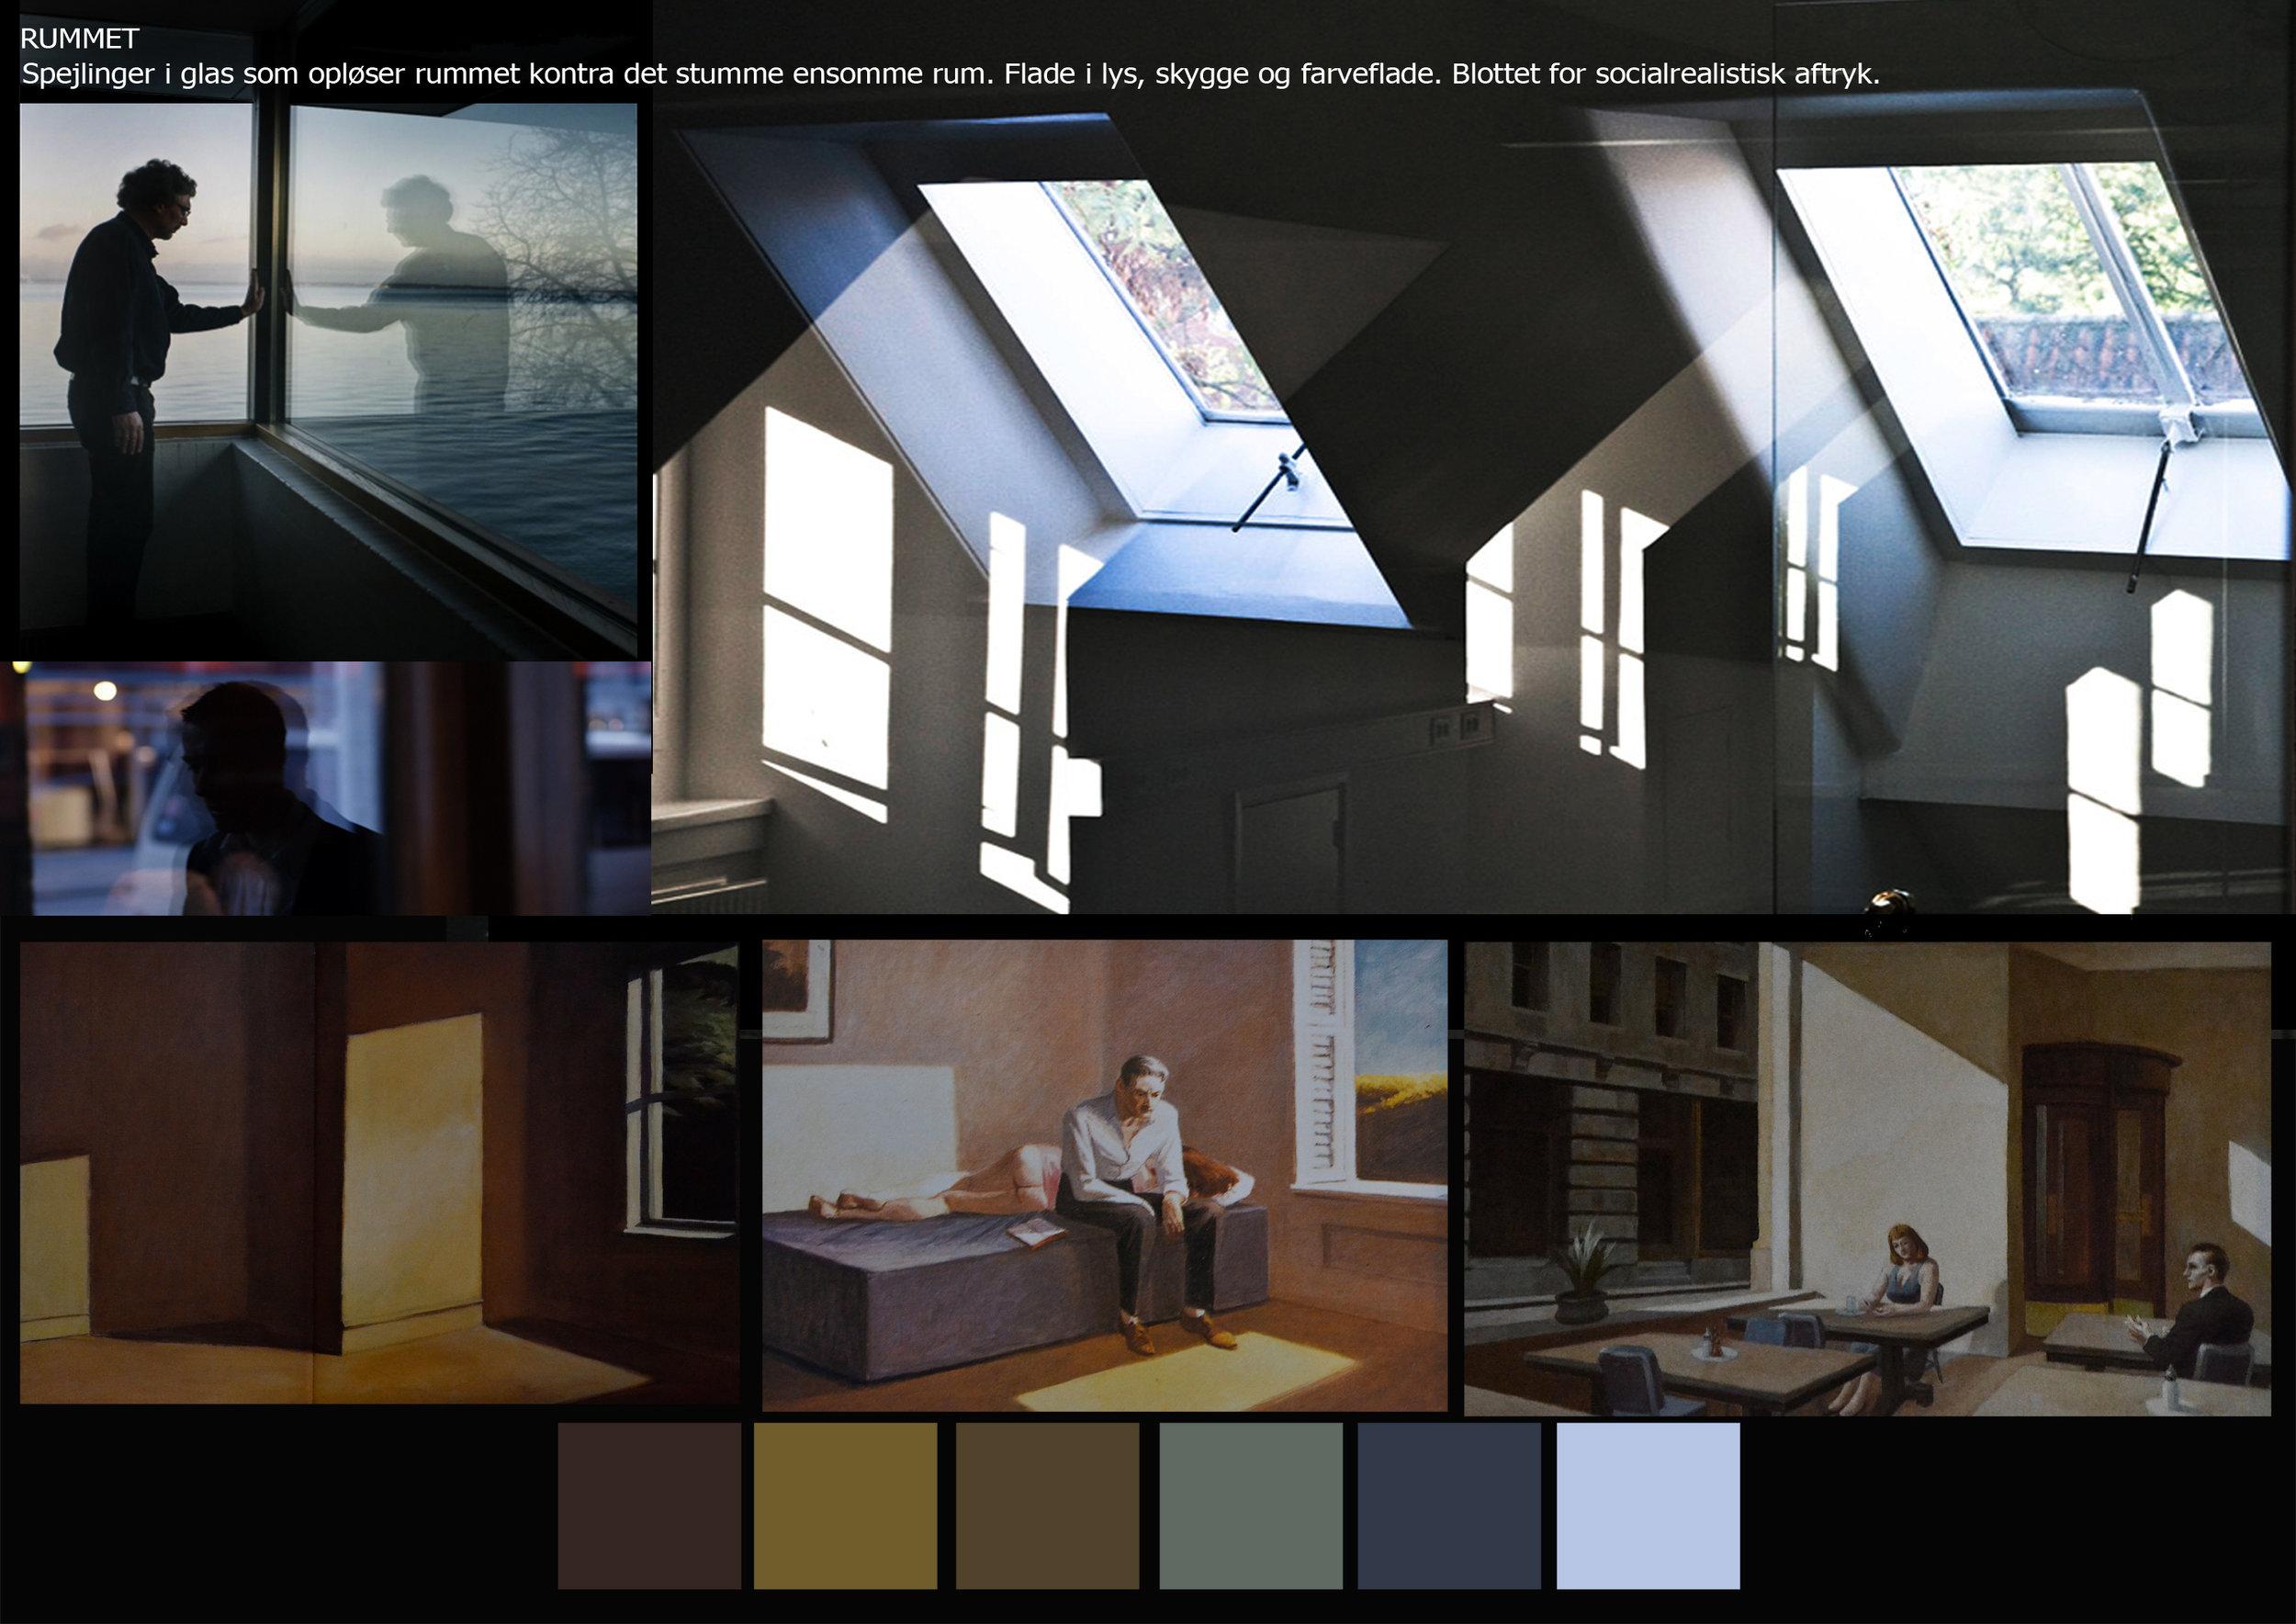 production_design_knirke_madelung_aminas_breve_2.jpg